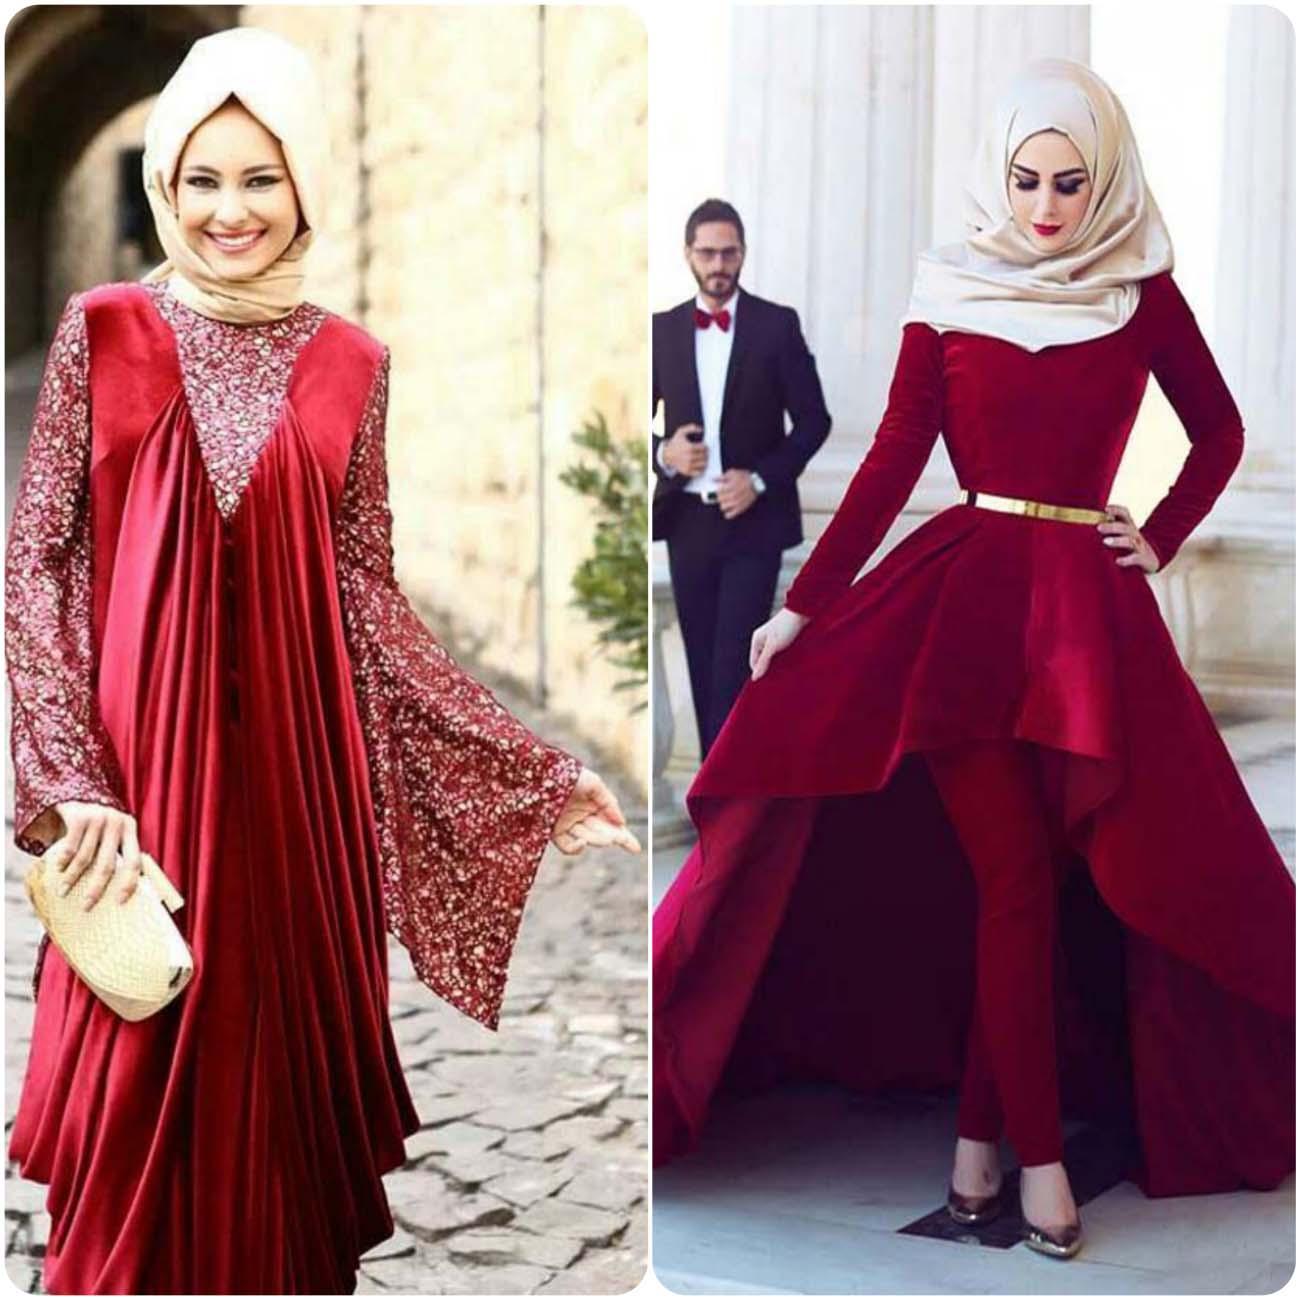 Abaya dress designs for wedding bridals 2106 stylo planet for Top wedding dress designers 2017